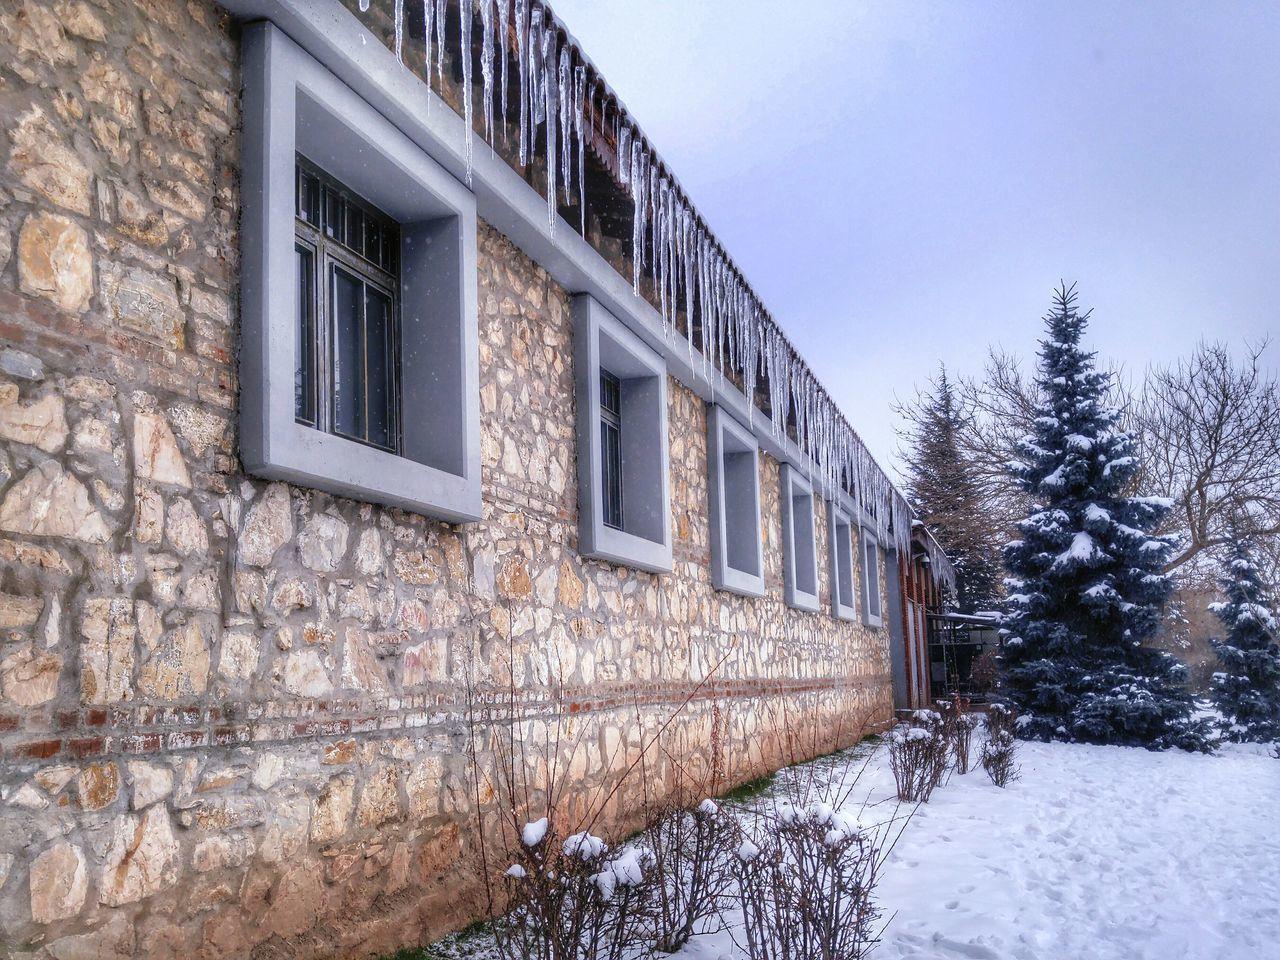 Winter in Anadolu University ❄ However, it's not colder than people. 😏 Winter Anadoluuniversitesi Eskişehir Turkey2017 Mobilephotography Lgg4photography EyeEm Best Shots Eyeemphotography EyeEmTurkey